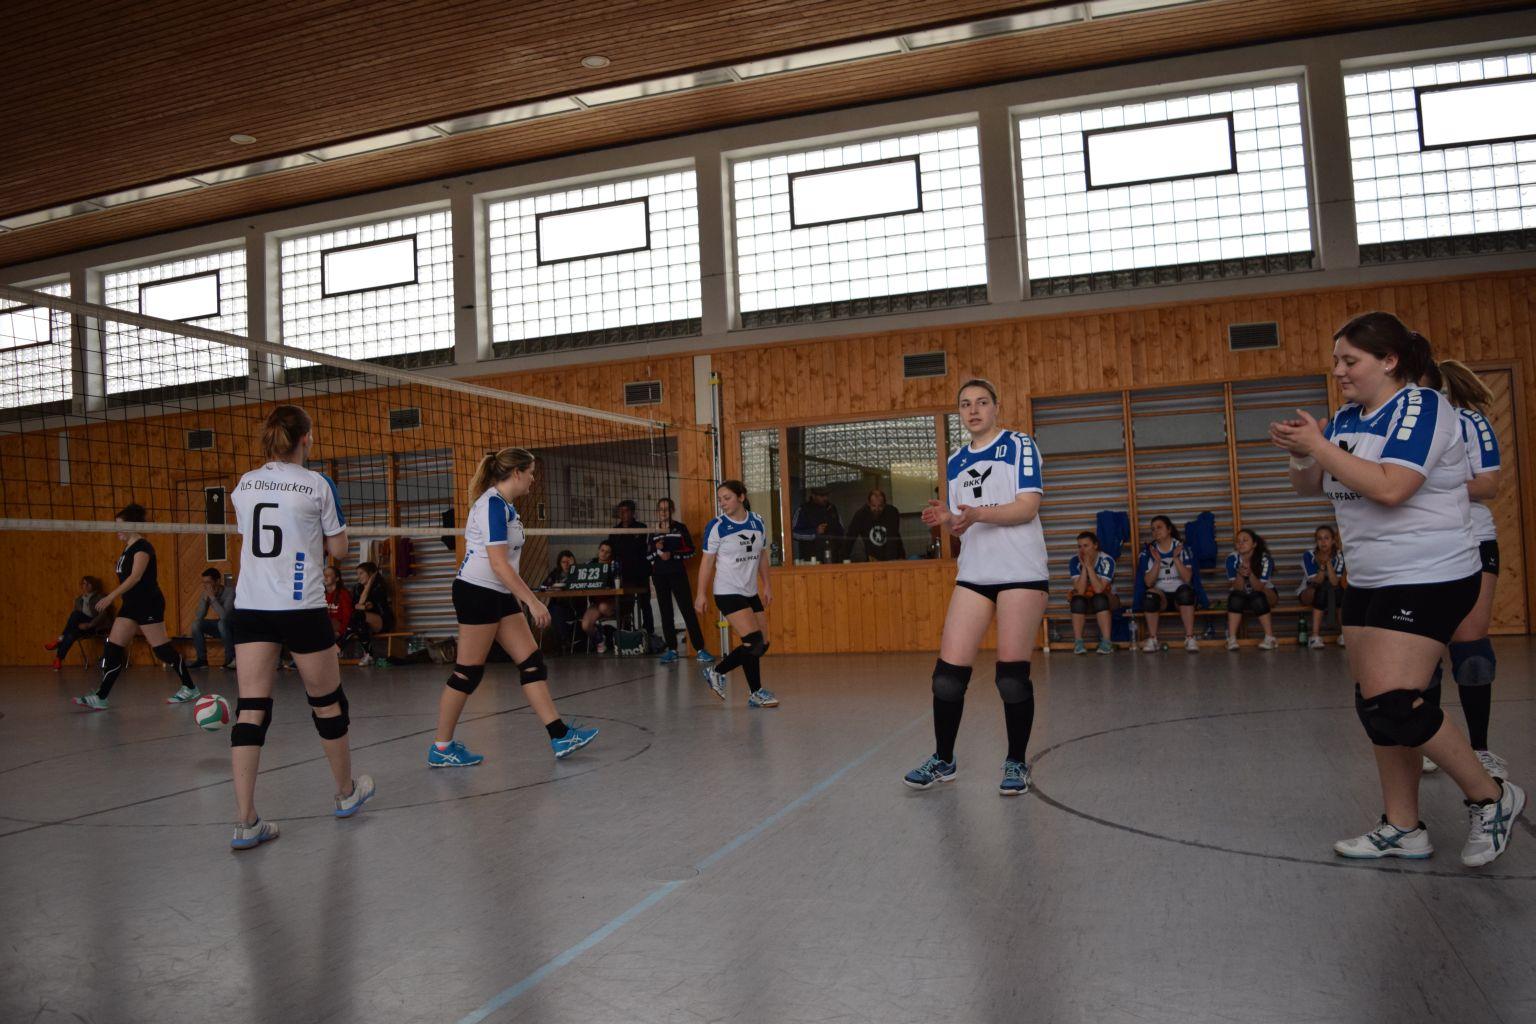 170311_Volleyball_DSC_0295